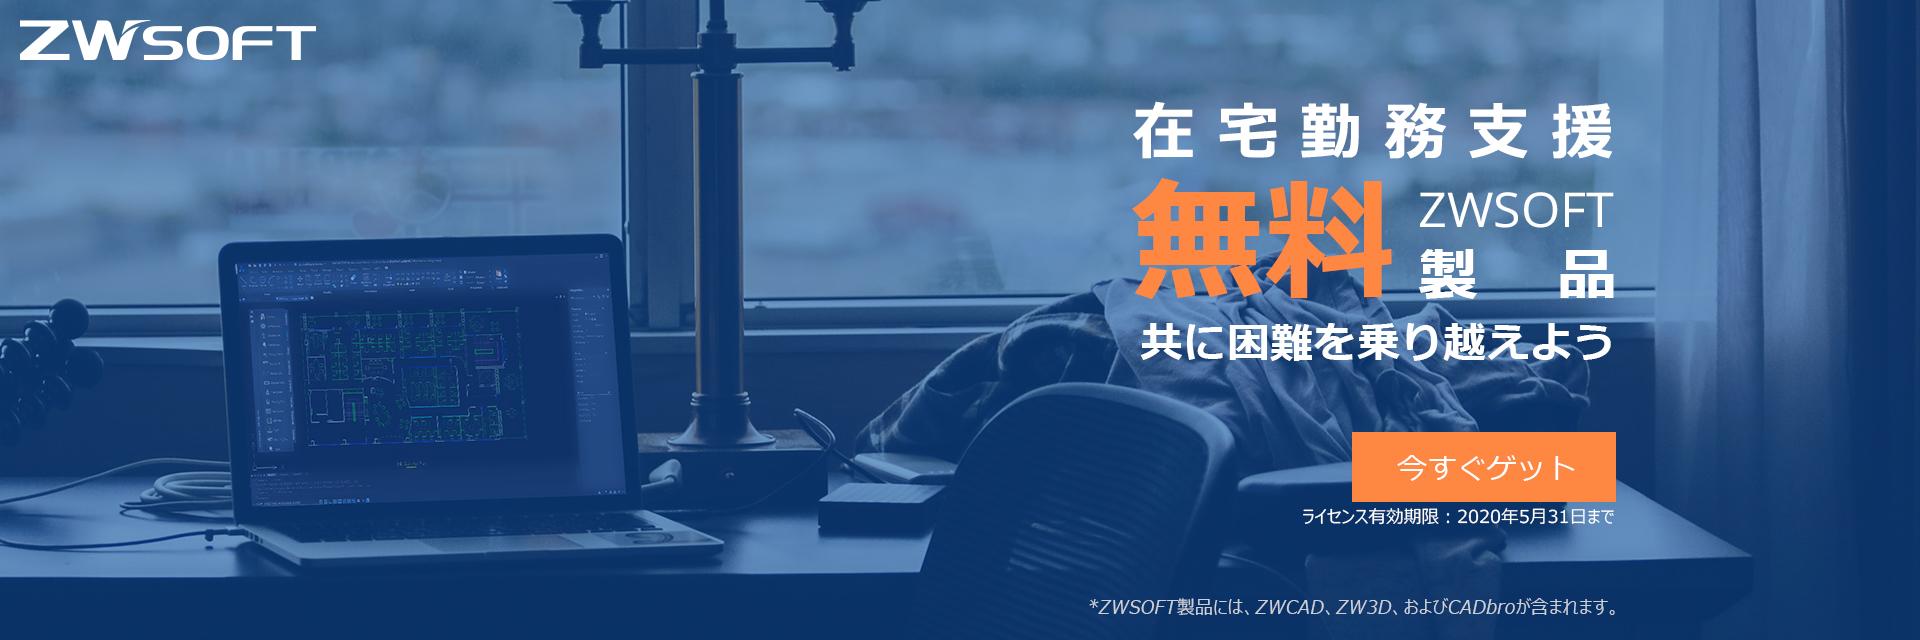 Main-Banner-jp.jpg